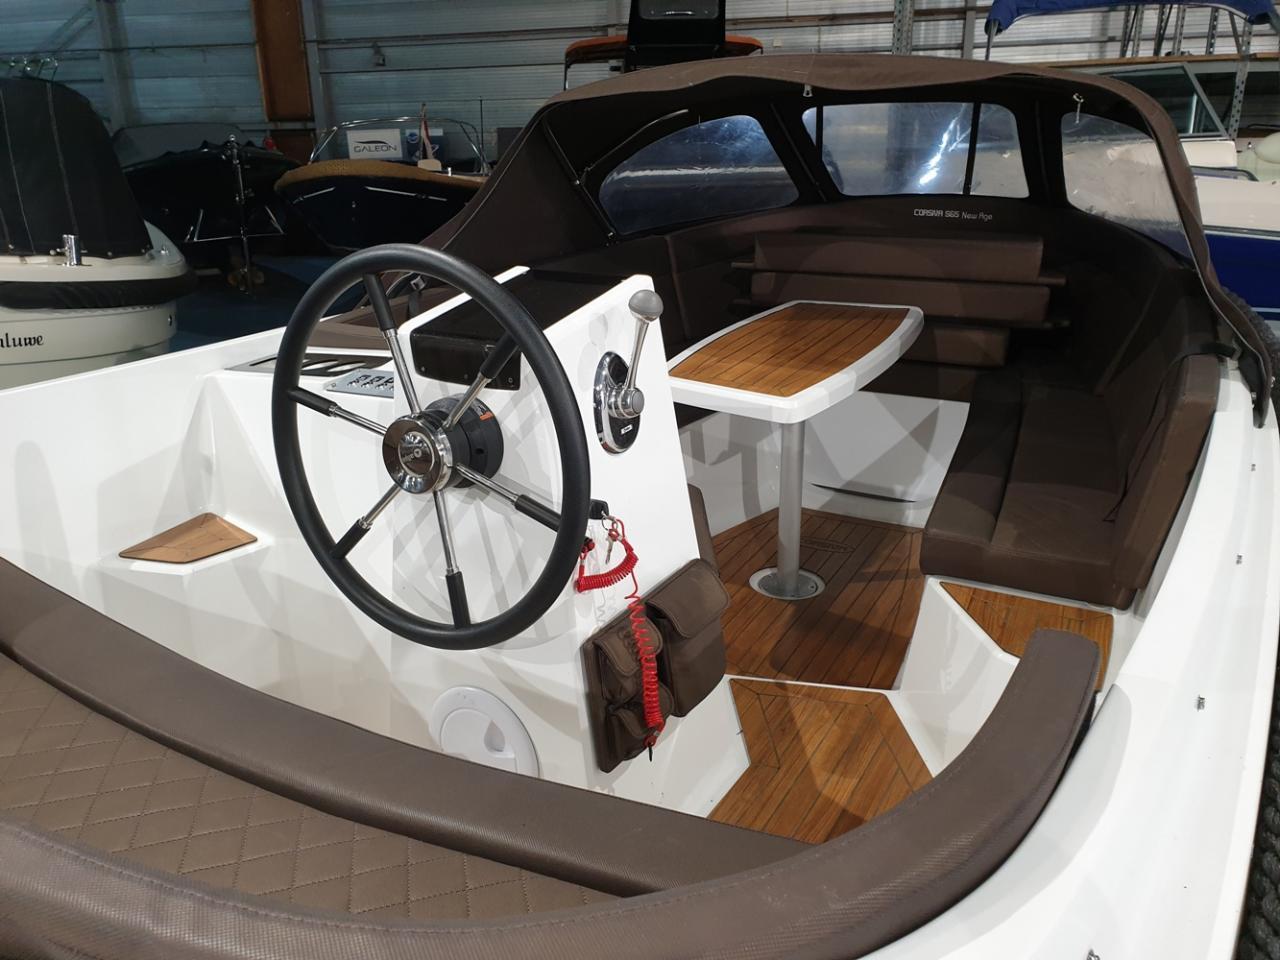 Corsiva 565 tender met Suzuki 25 pk 4